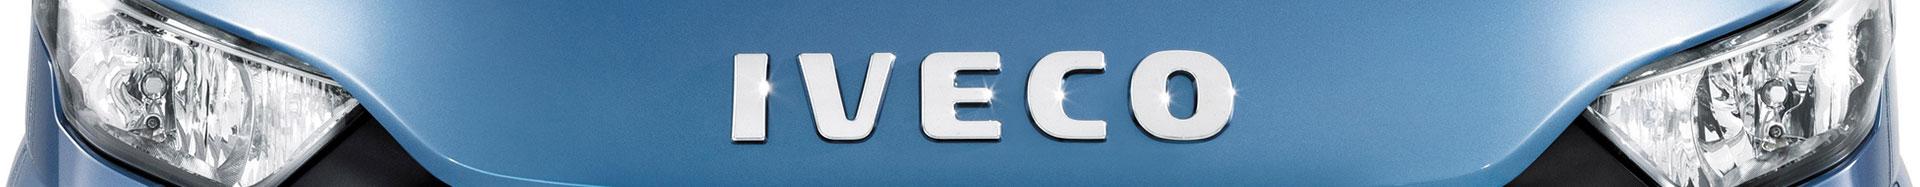 talleres-navarro-iveco-logo